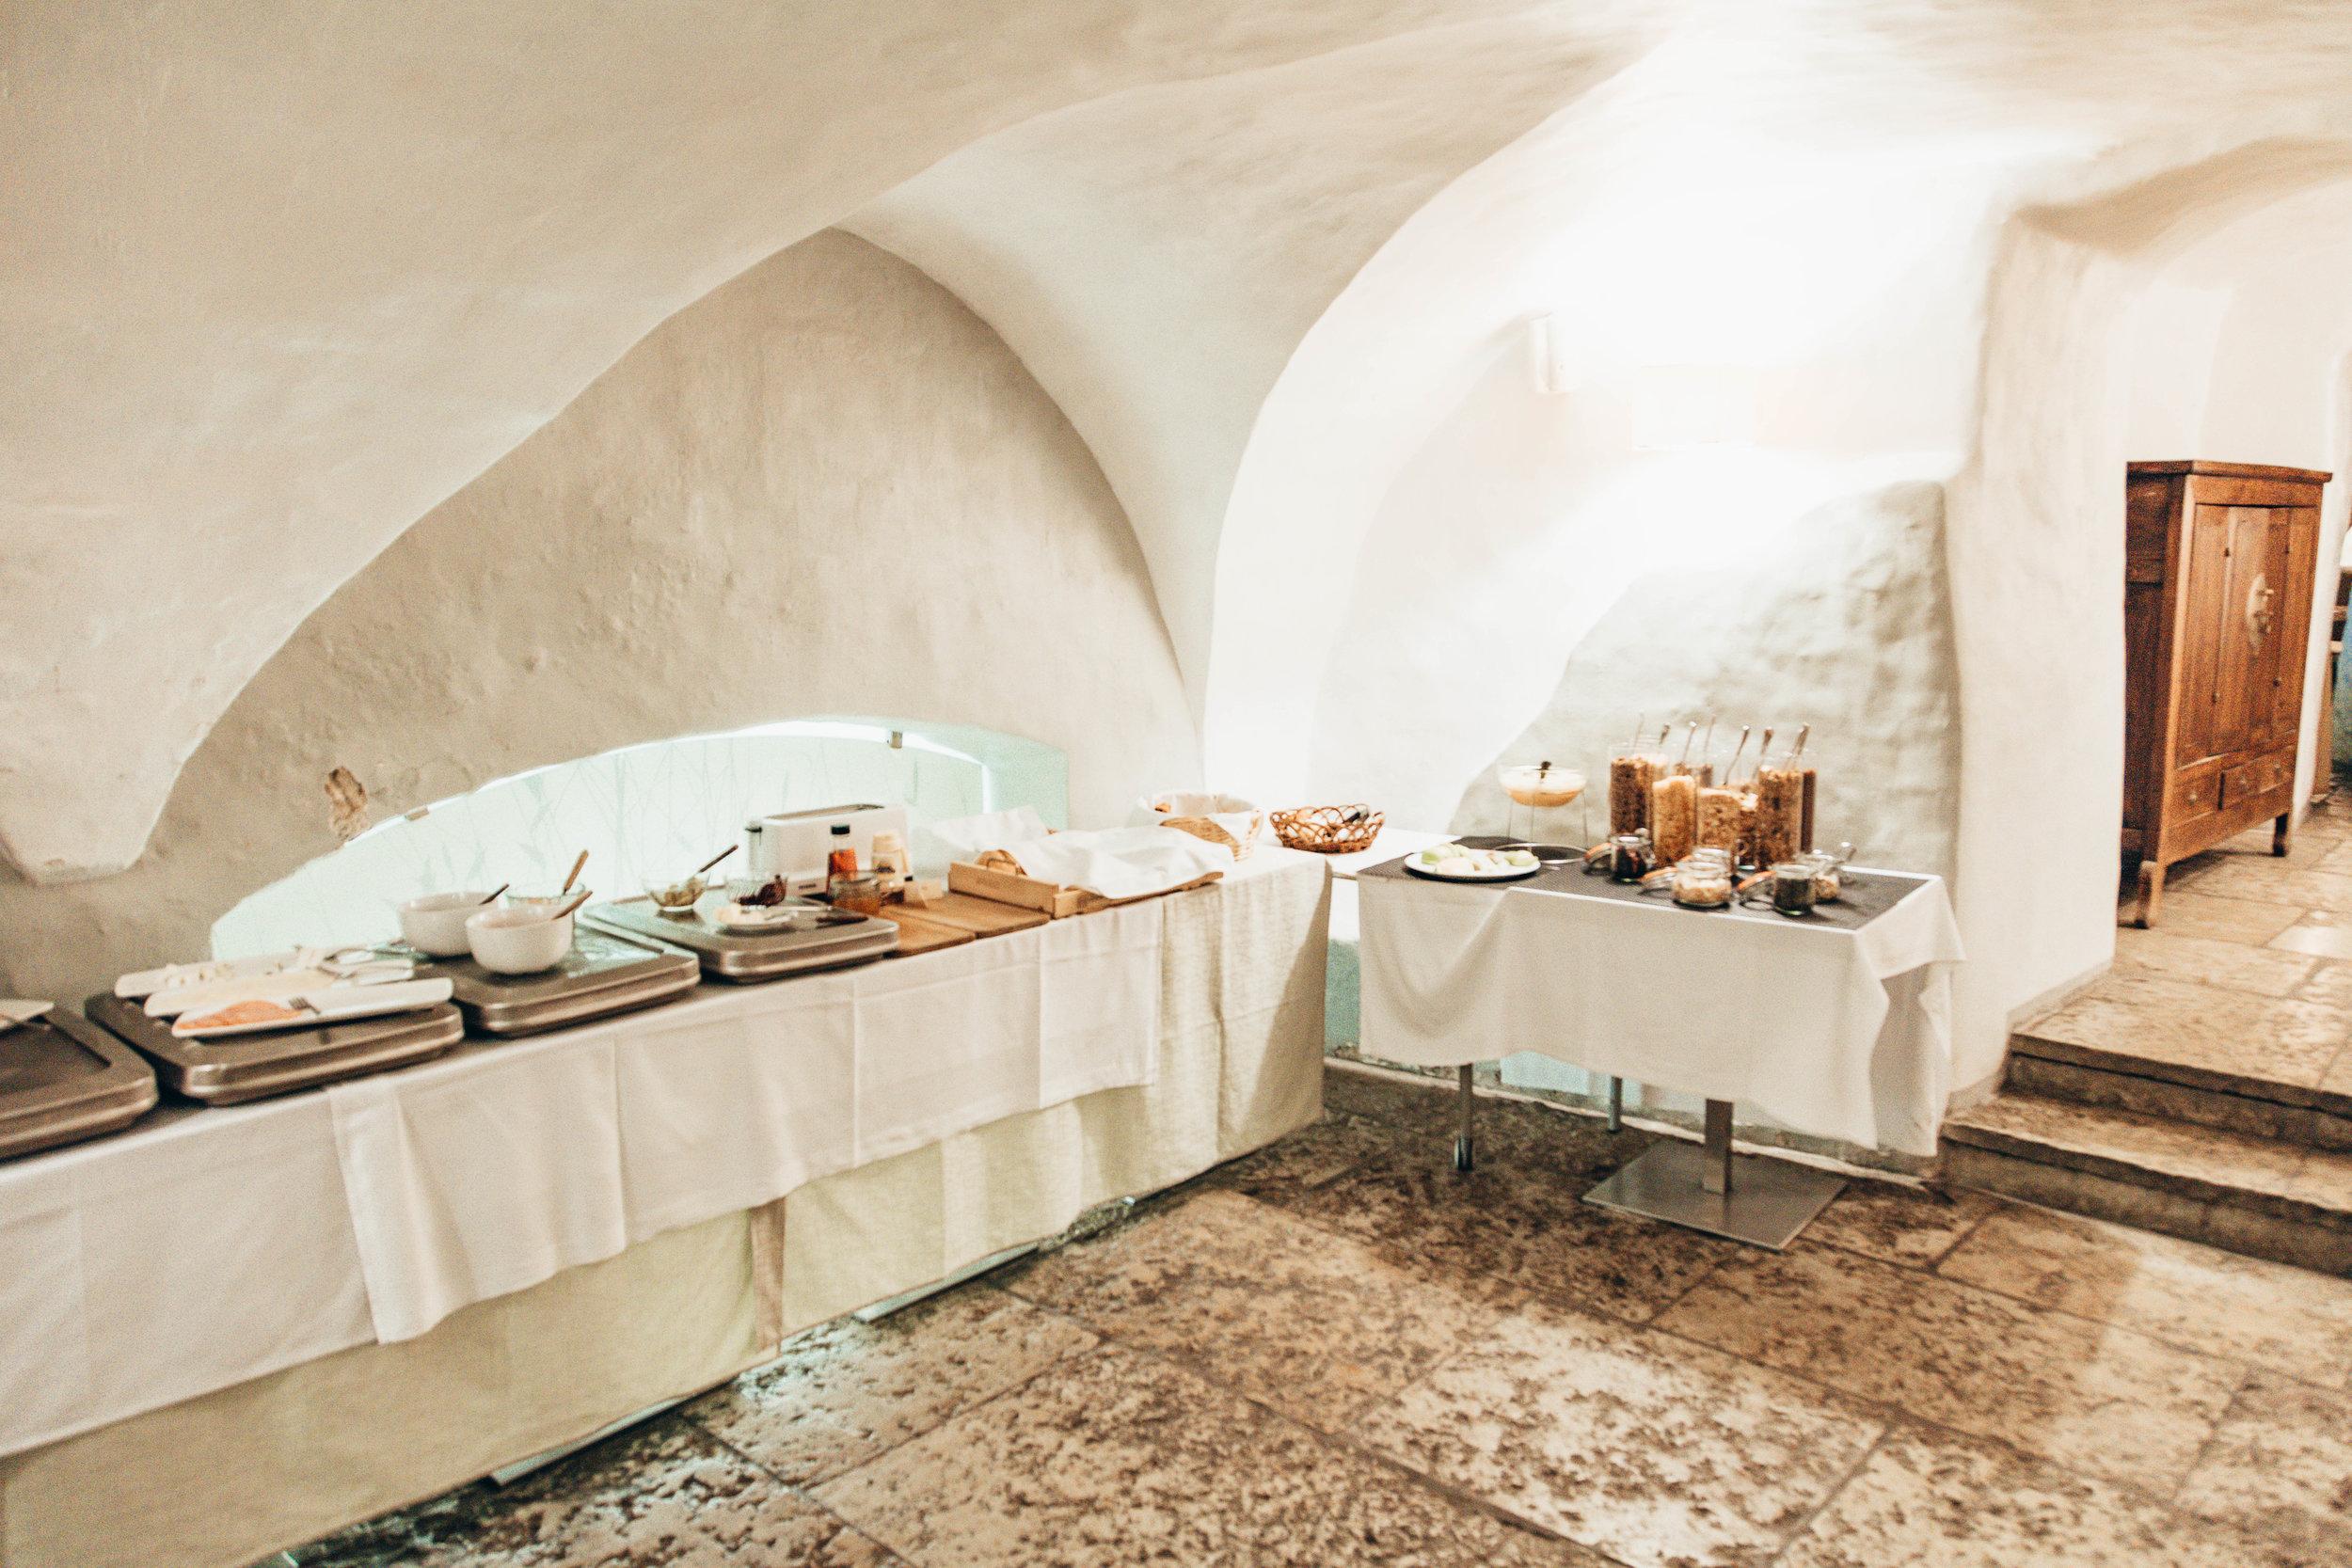 Merchants+House+Hotel+Tallinn+Estonia-2.jpg